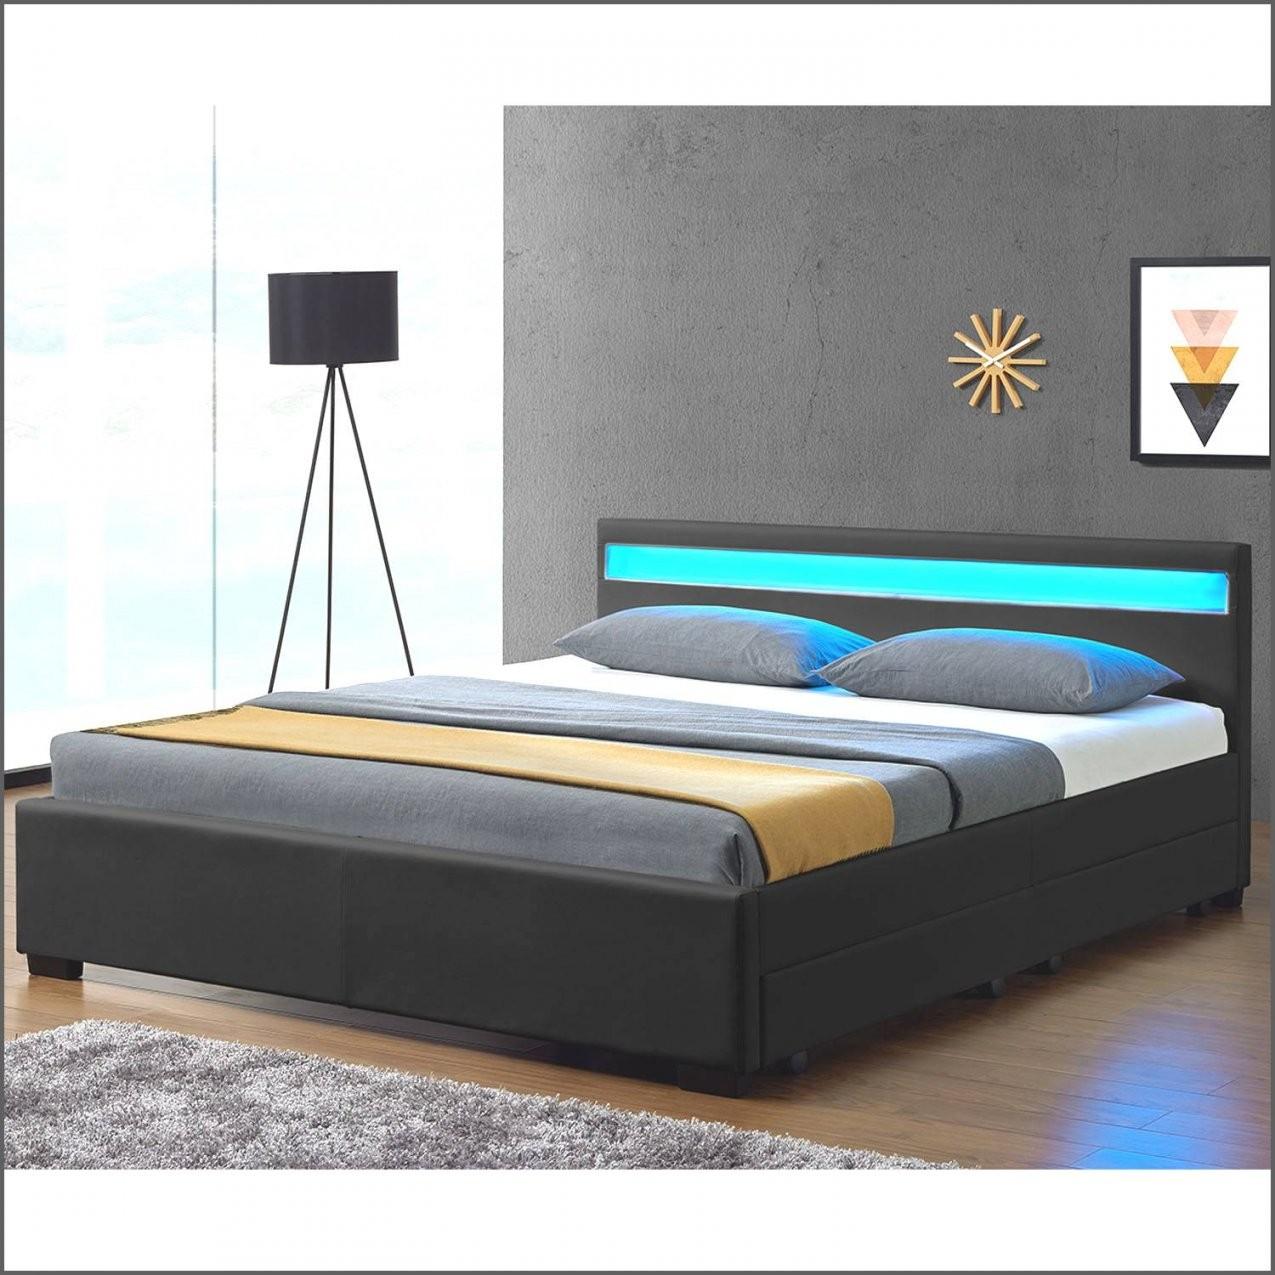 betten mit bettkasten gunstig real polsterbett 160x200. Black Bedroom Furniture Sets. Home Design Ideas